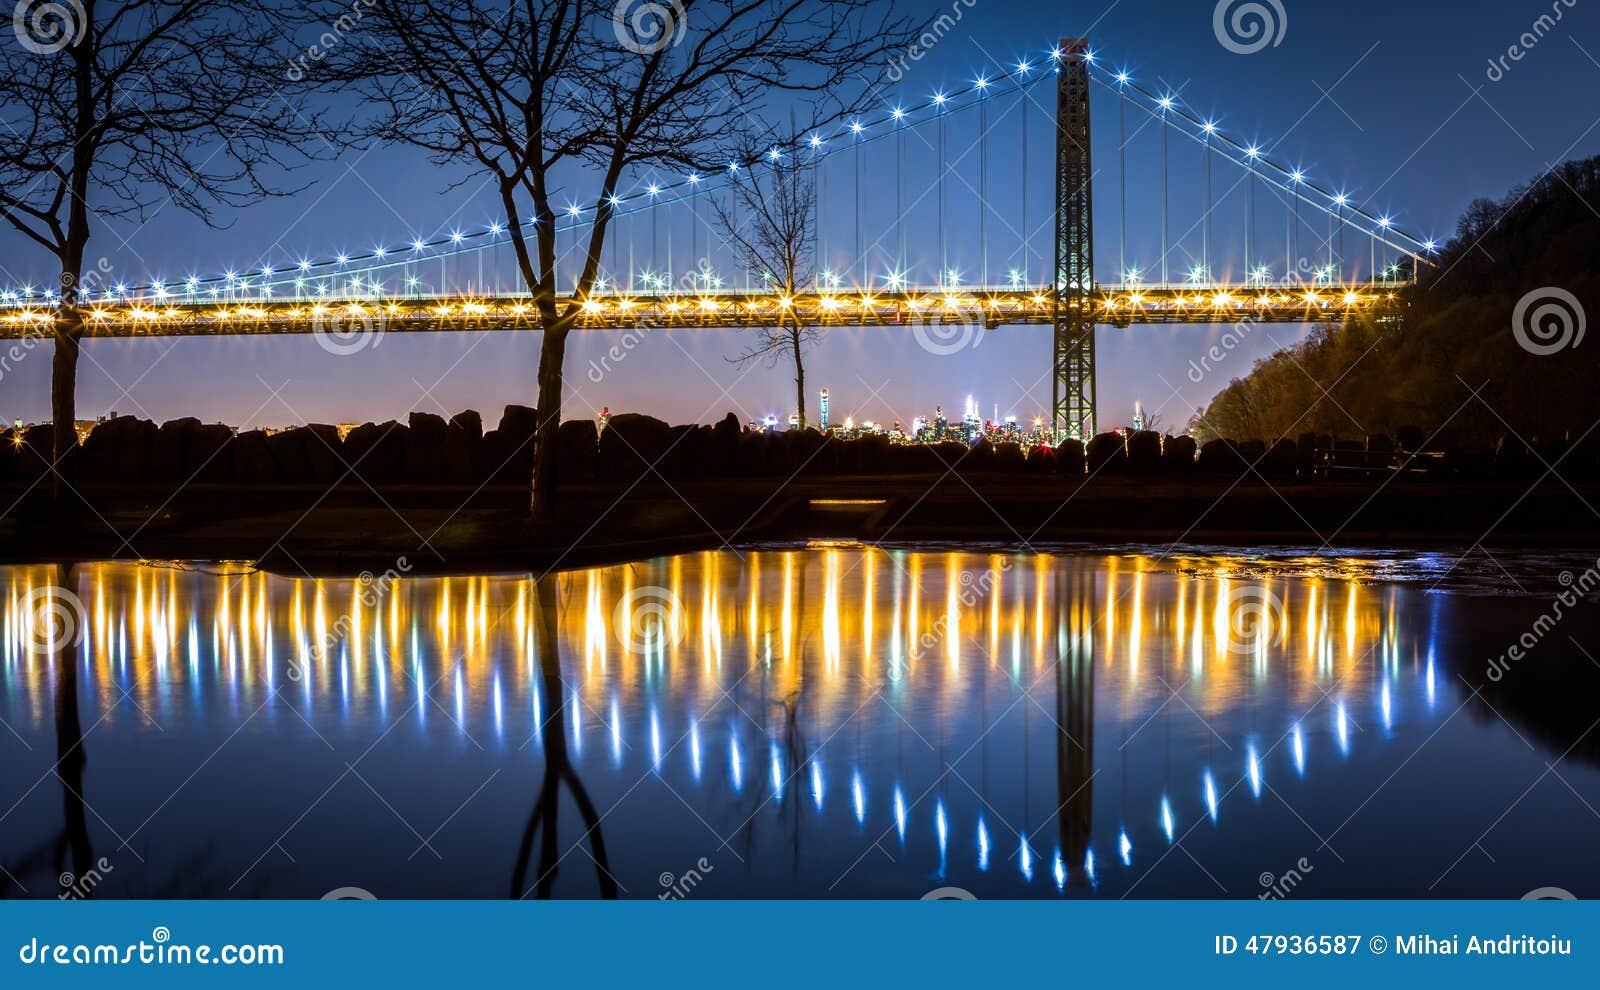 George Washington Bridge by night